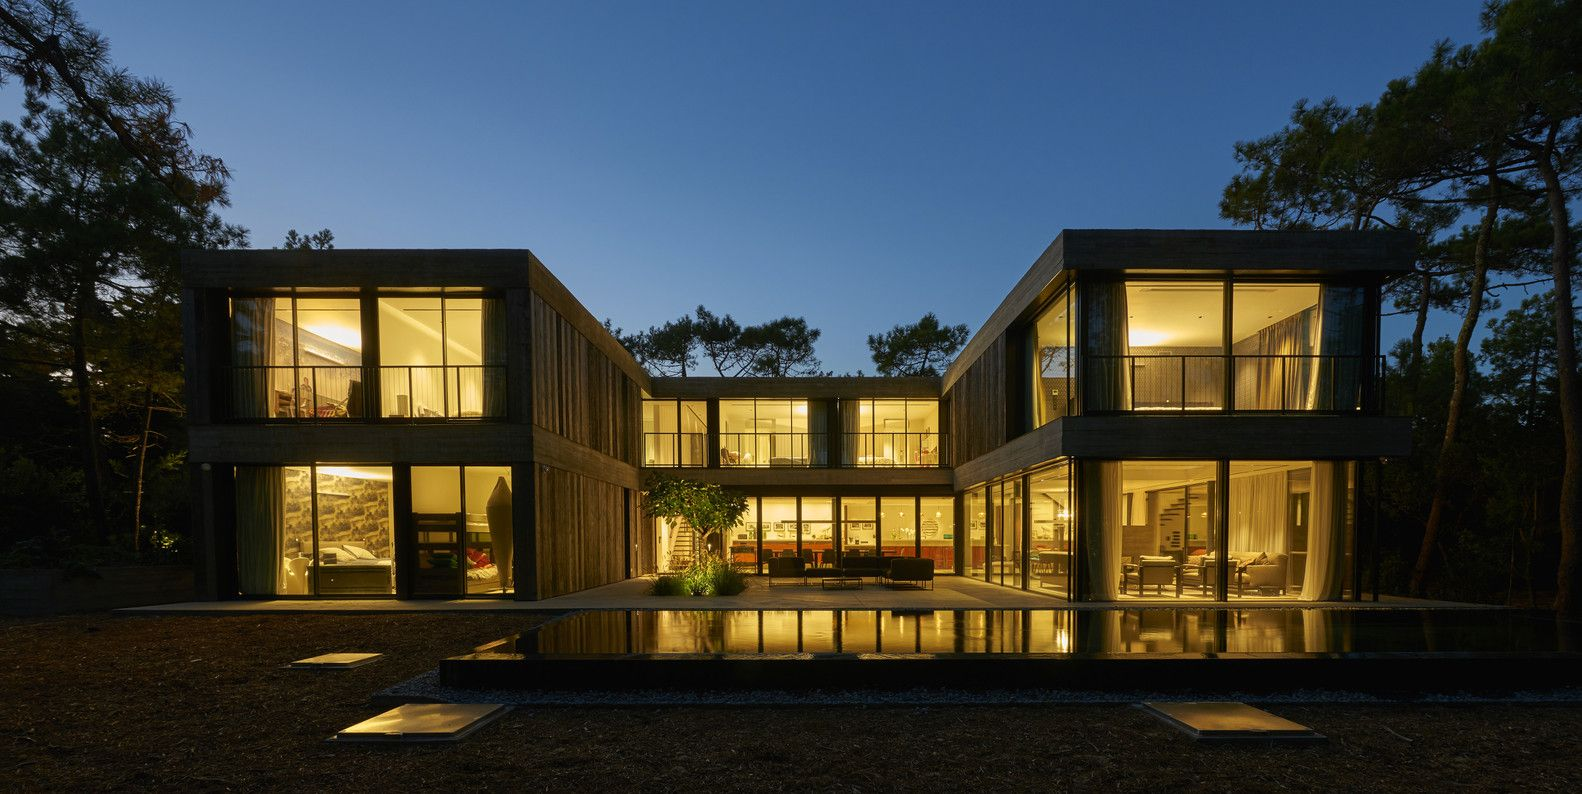 Gallery of Villa Eiders / Hugues Touton & Edouard Touton